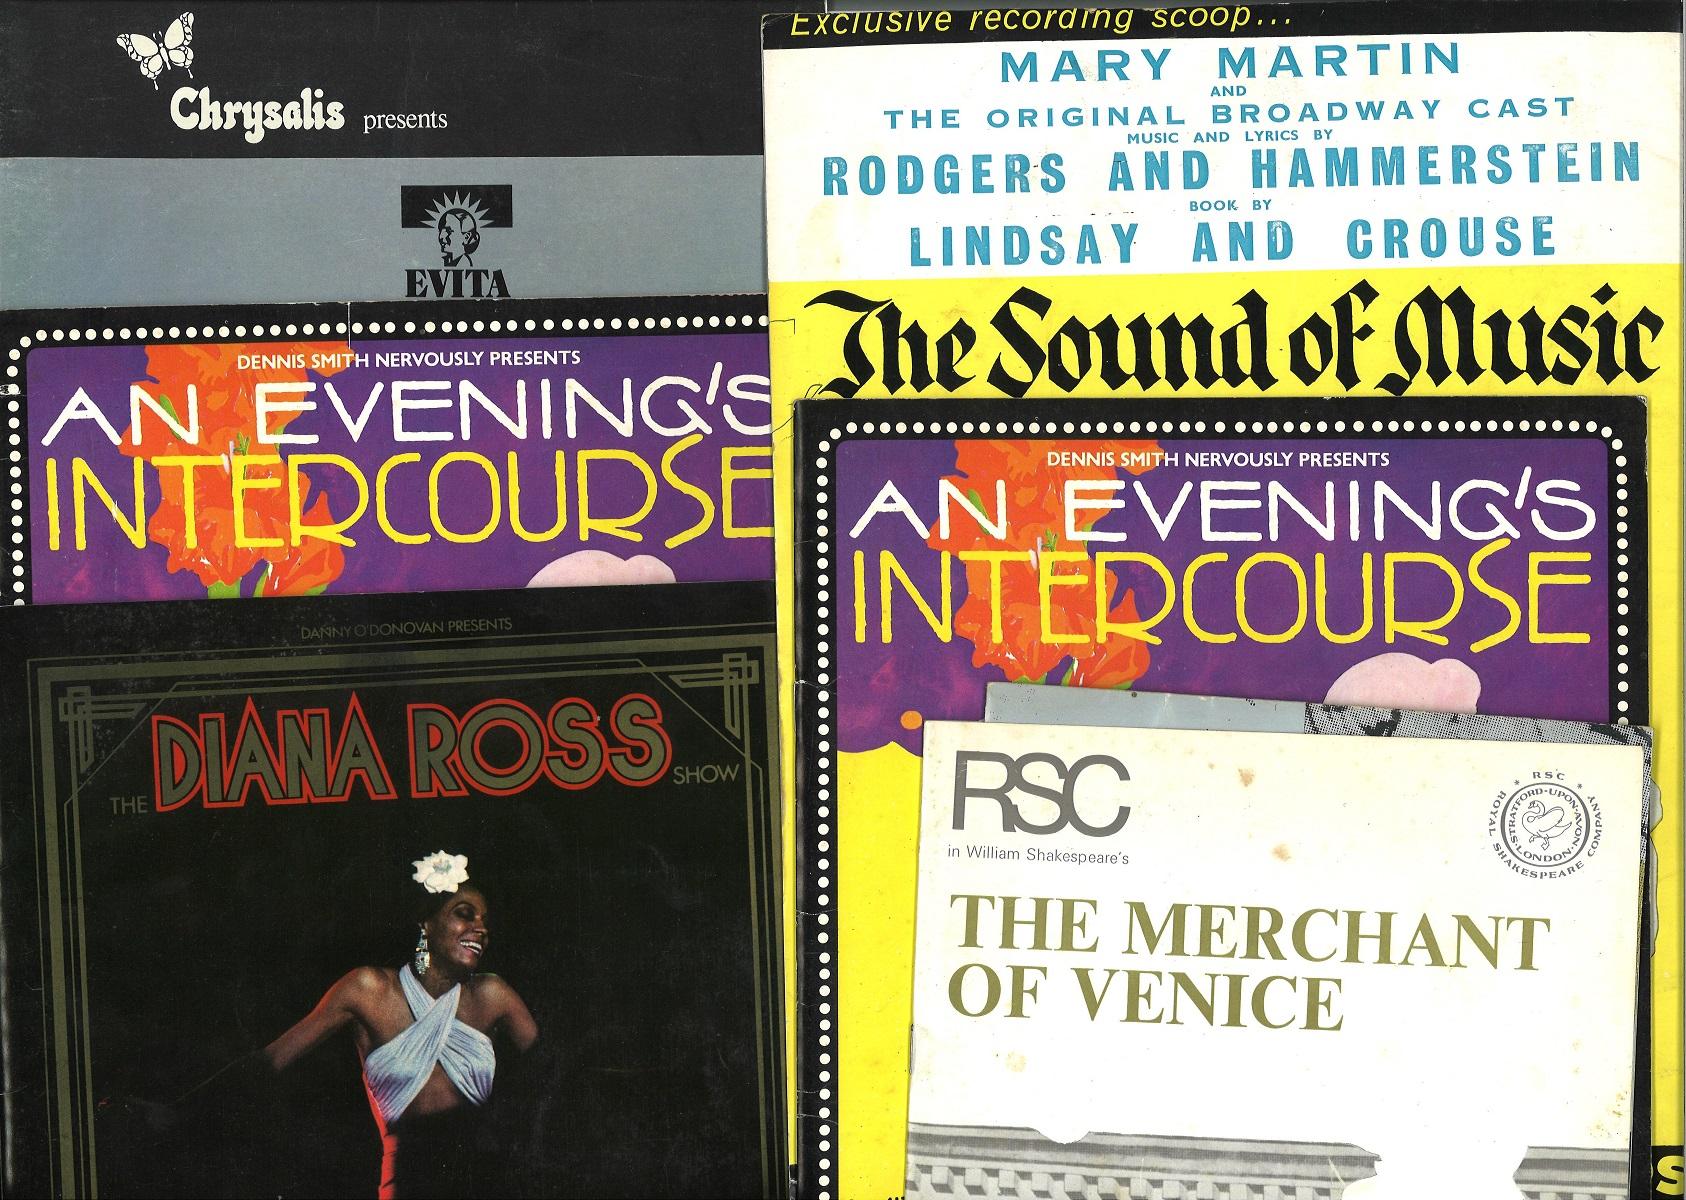 Theatre programme collection 940 onwards includes Jaz Jamboree, Jesus Christ Superstar, Barry - Image 2 of 2